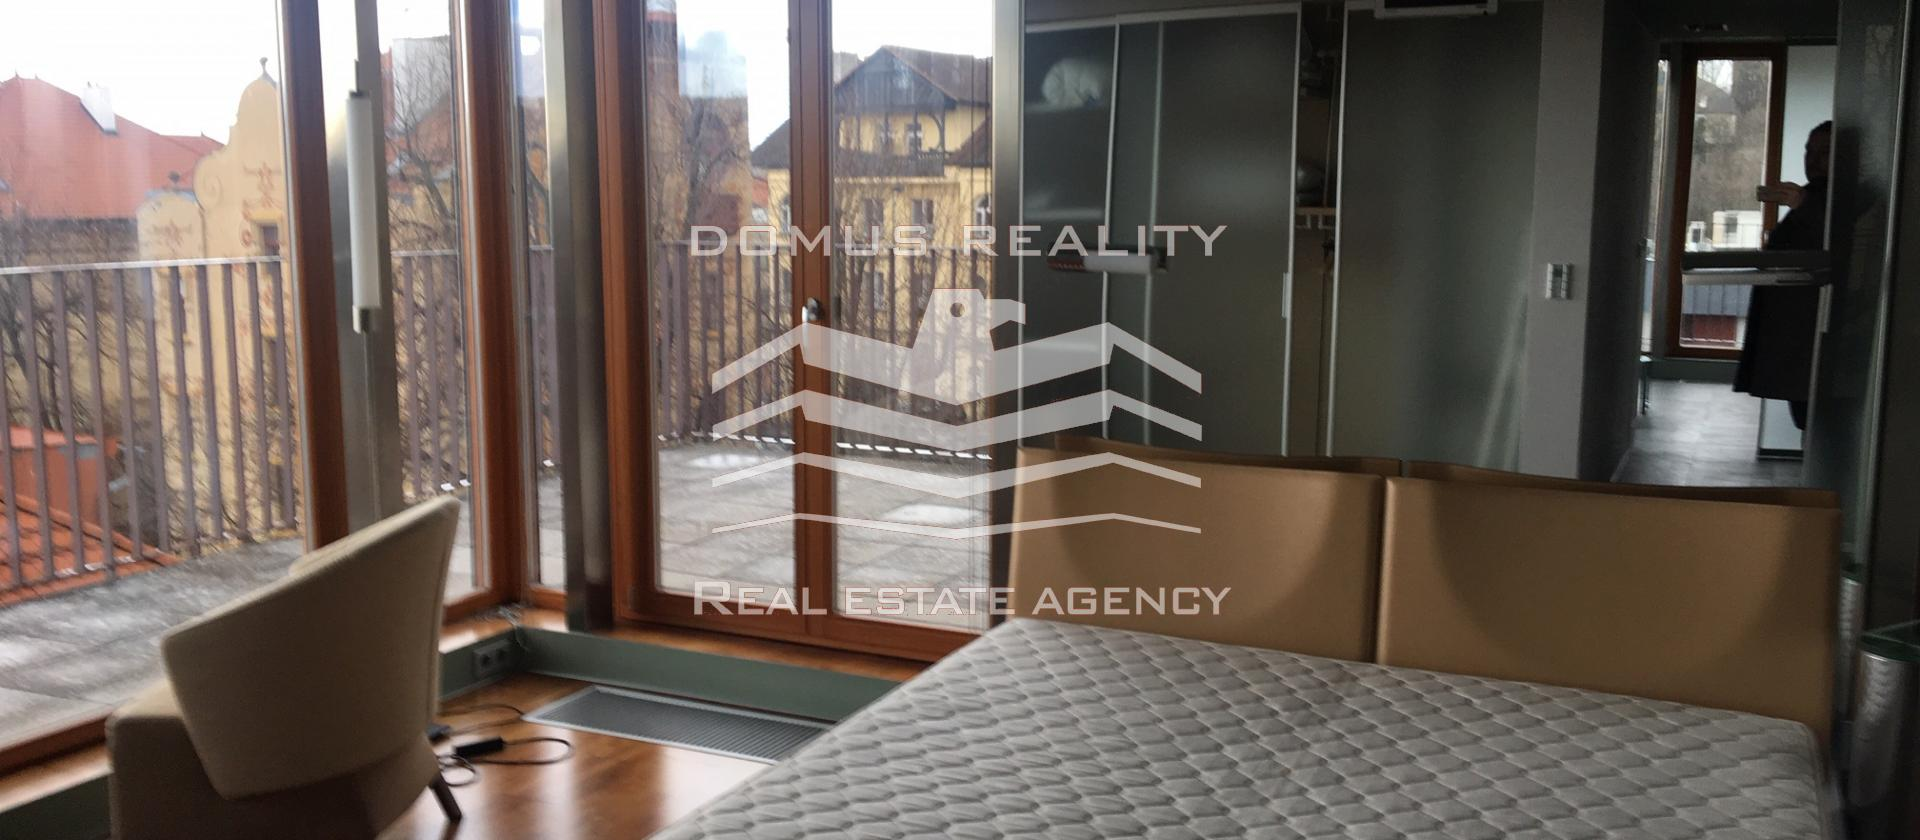 Pronajem bytu 2+kk 112 m² ulice U Nikolajky, Praha 5 -